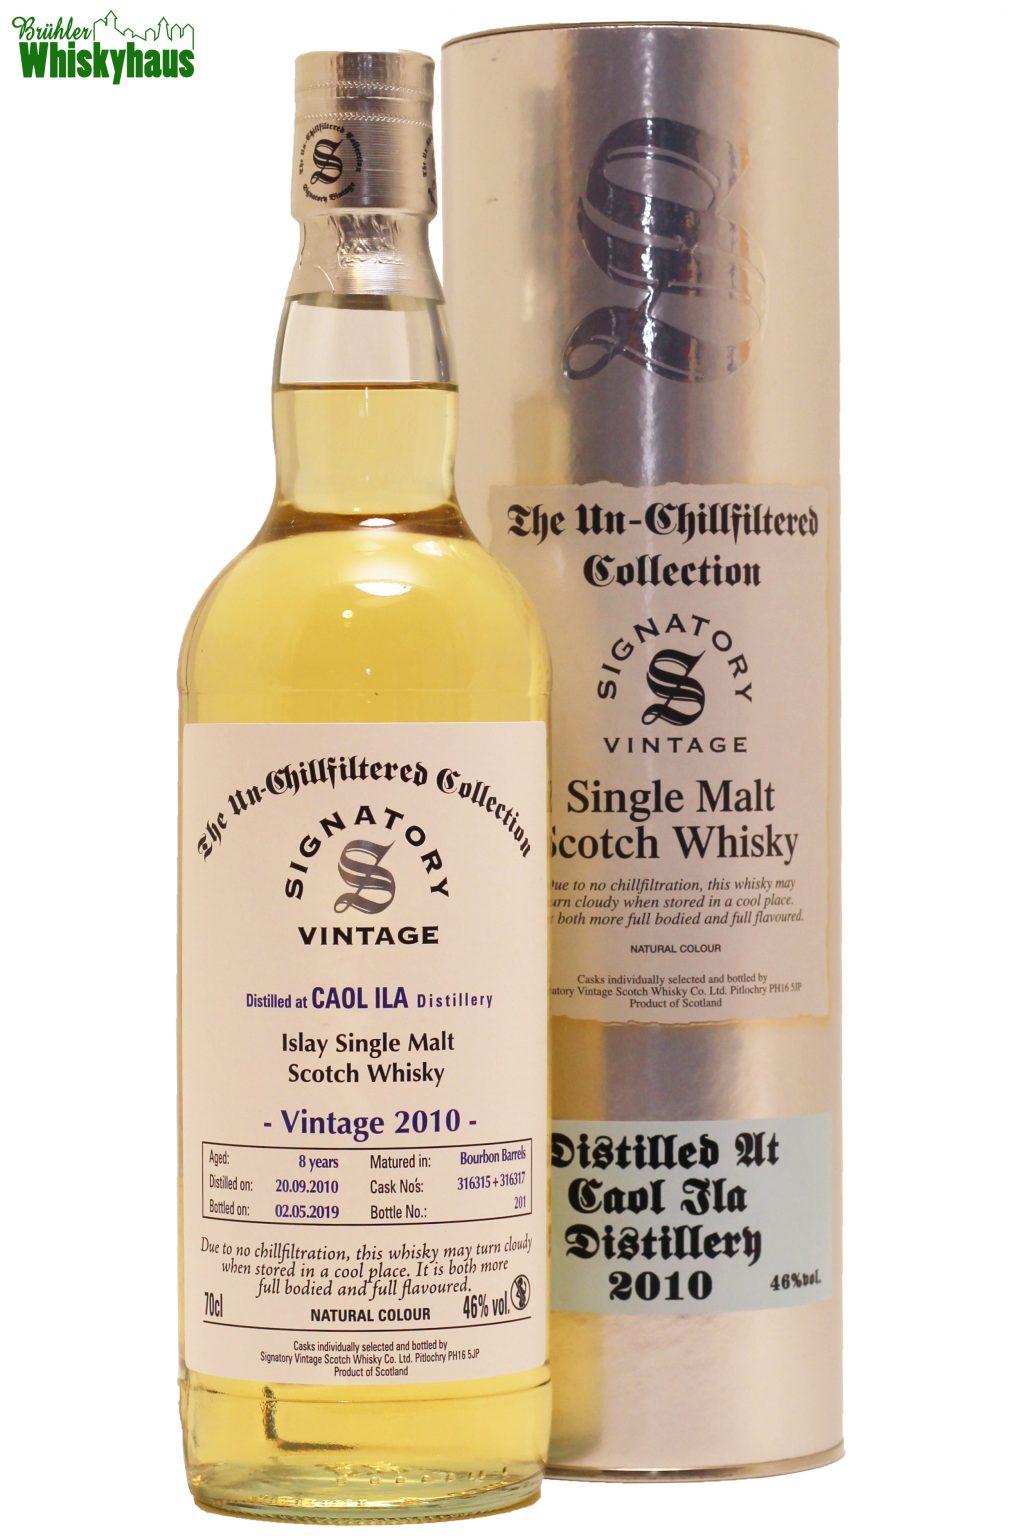 Caol Ila 8 Jahre - Bourbon Barrel 316315 + 316317 - Signatory Vintage - Single Malt Scotch Whisky